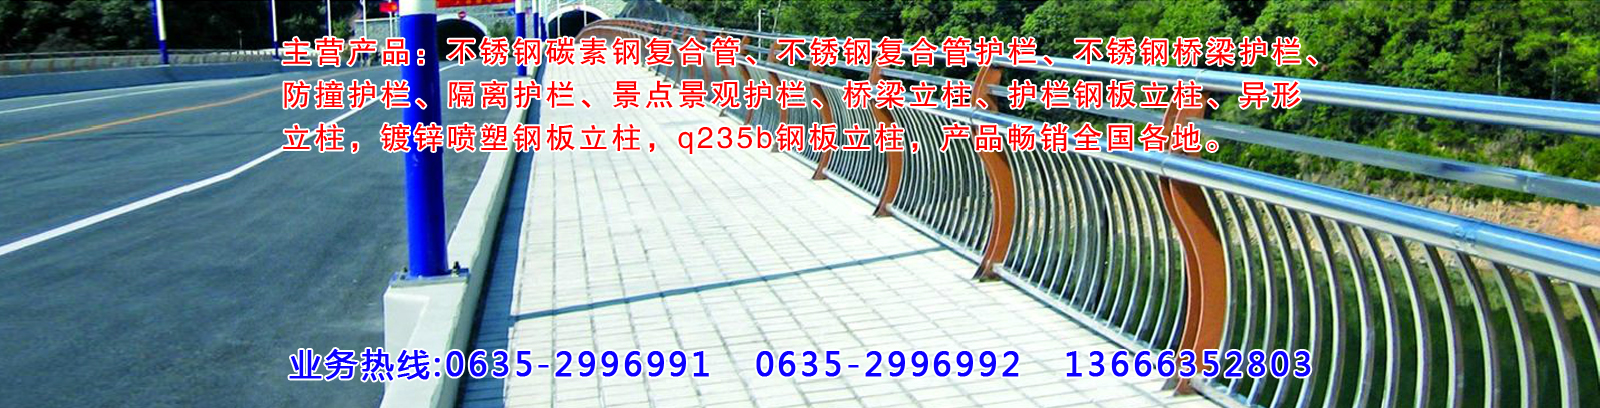 聊(liao)城市(shi)潤達(da)管材有限(xian)公(gong)司(si)